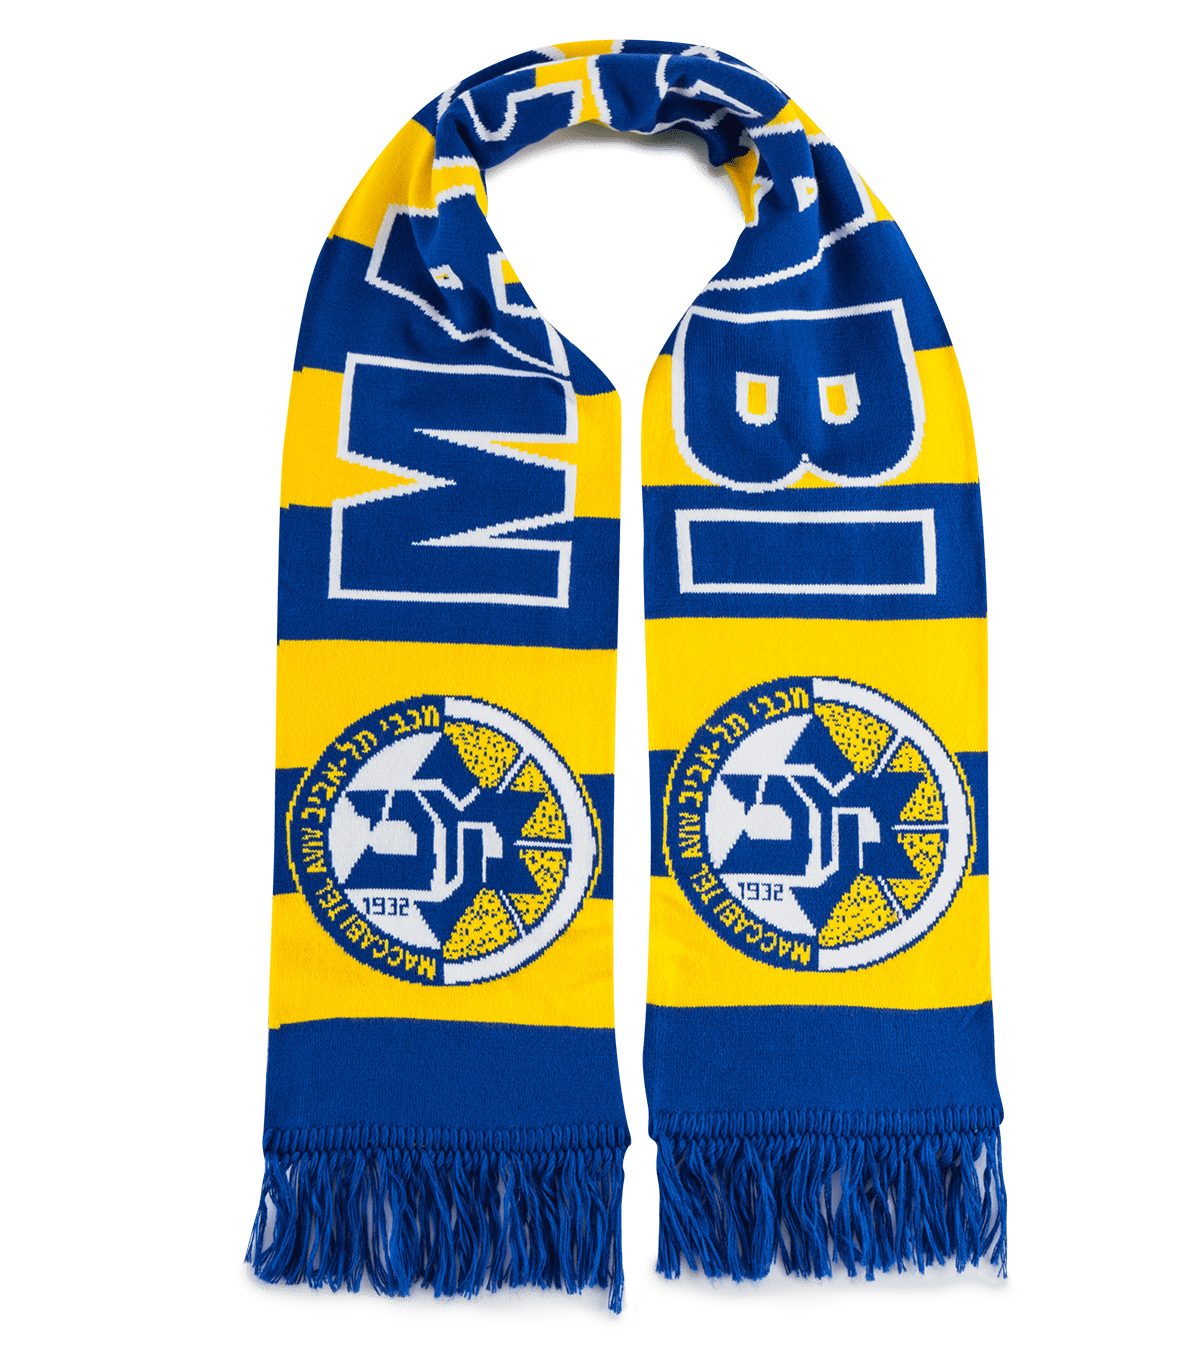 Scarf MACCABI TEL AVIV ISRAEL Scarf Cachecol sjaal no flag Tricot